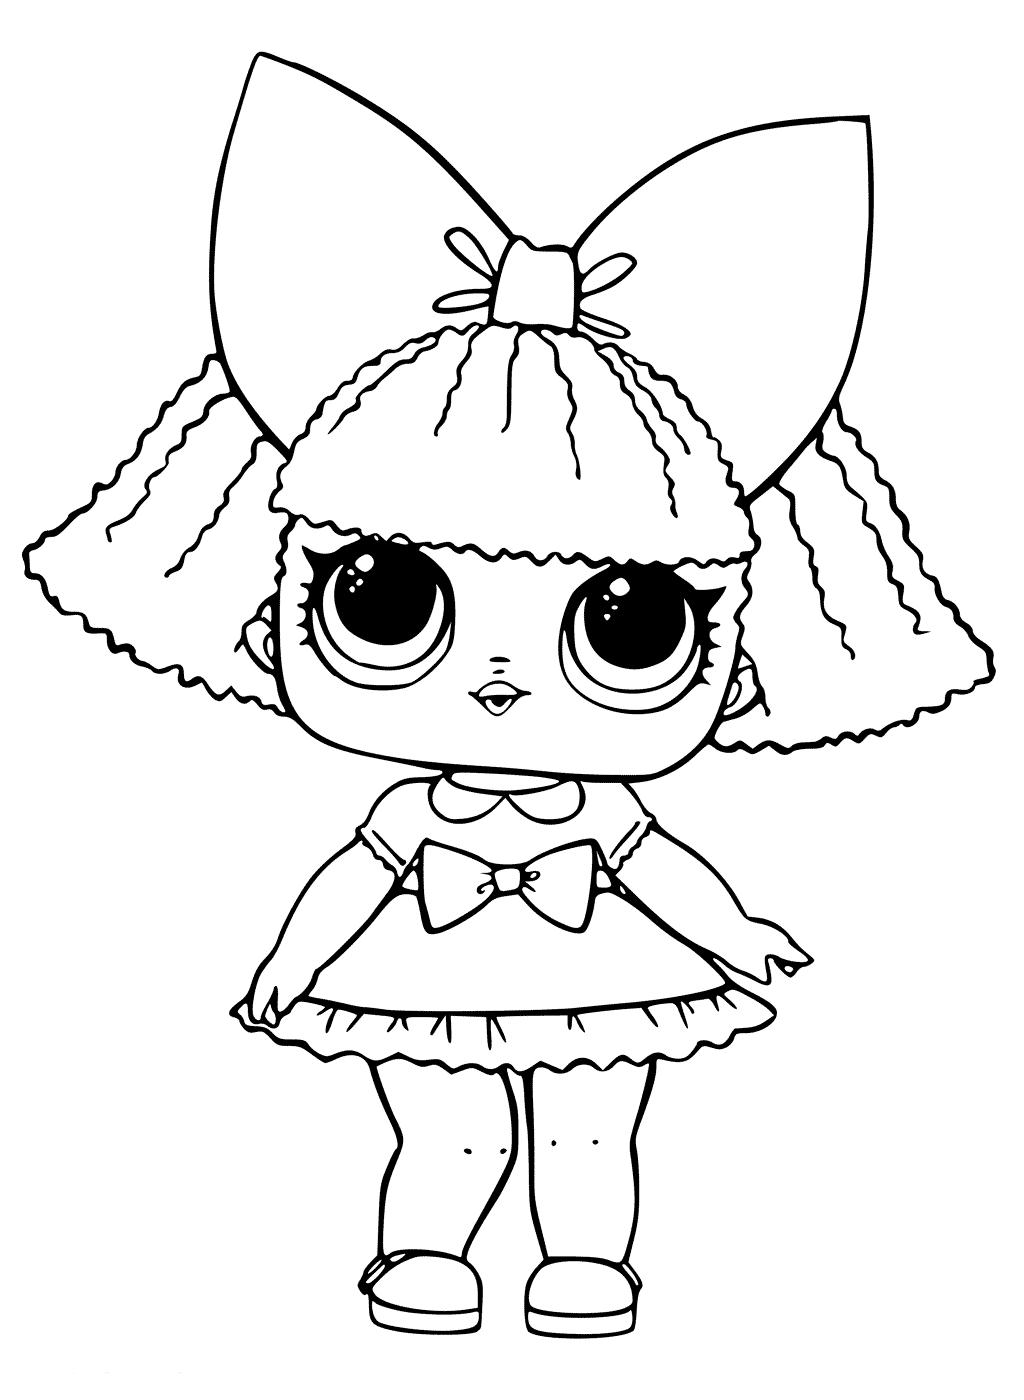 Кукла ЛОЛ королева блесток - Куклы LOL | Раскраски ...